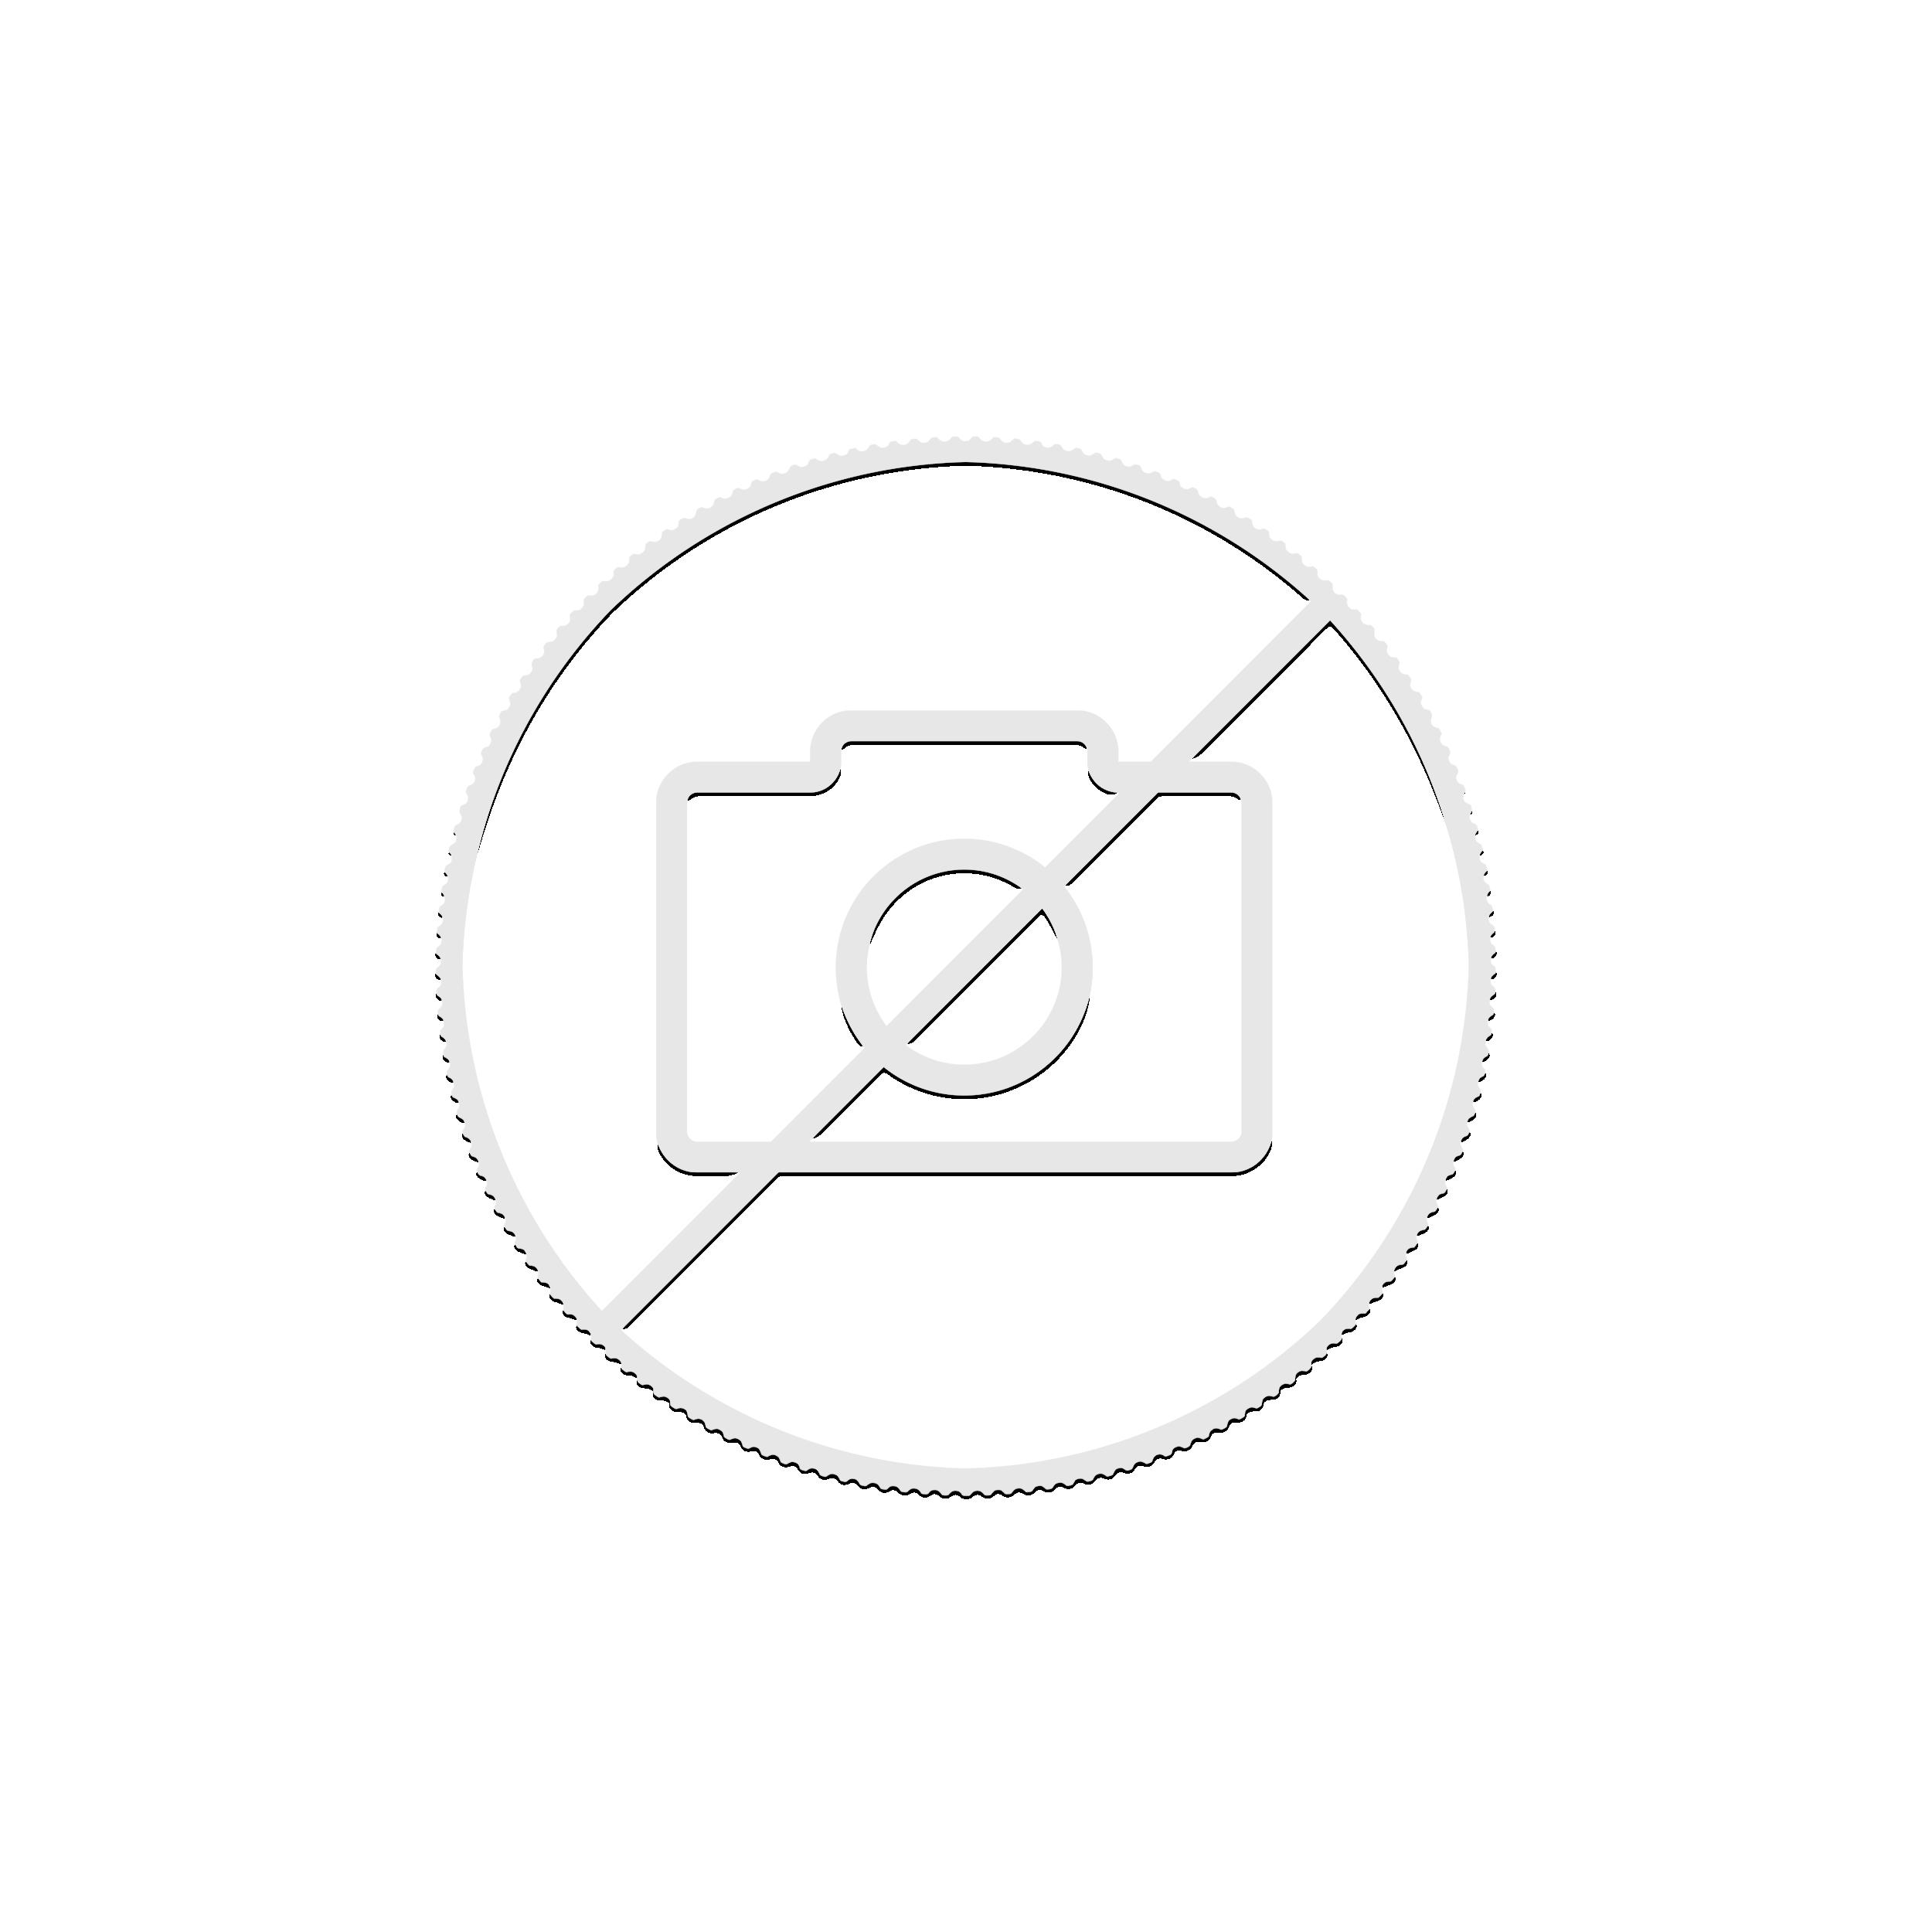 1 troy ounce zilverbaar diverse producenten